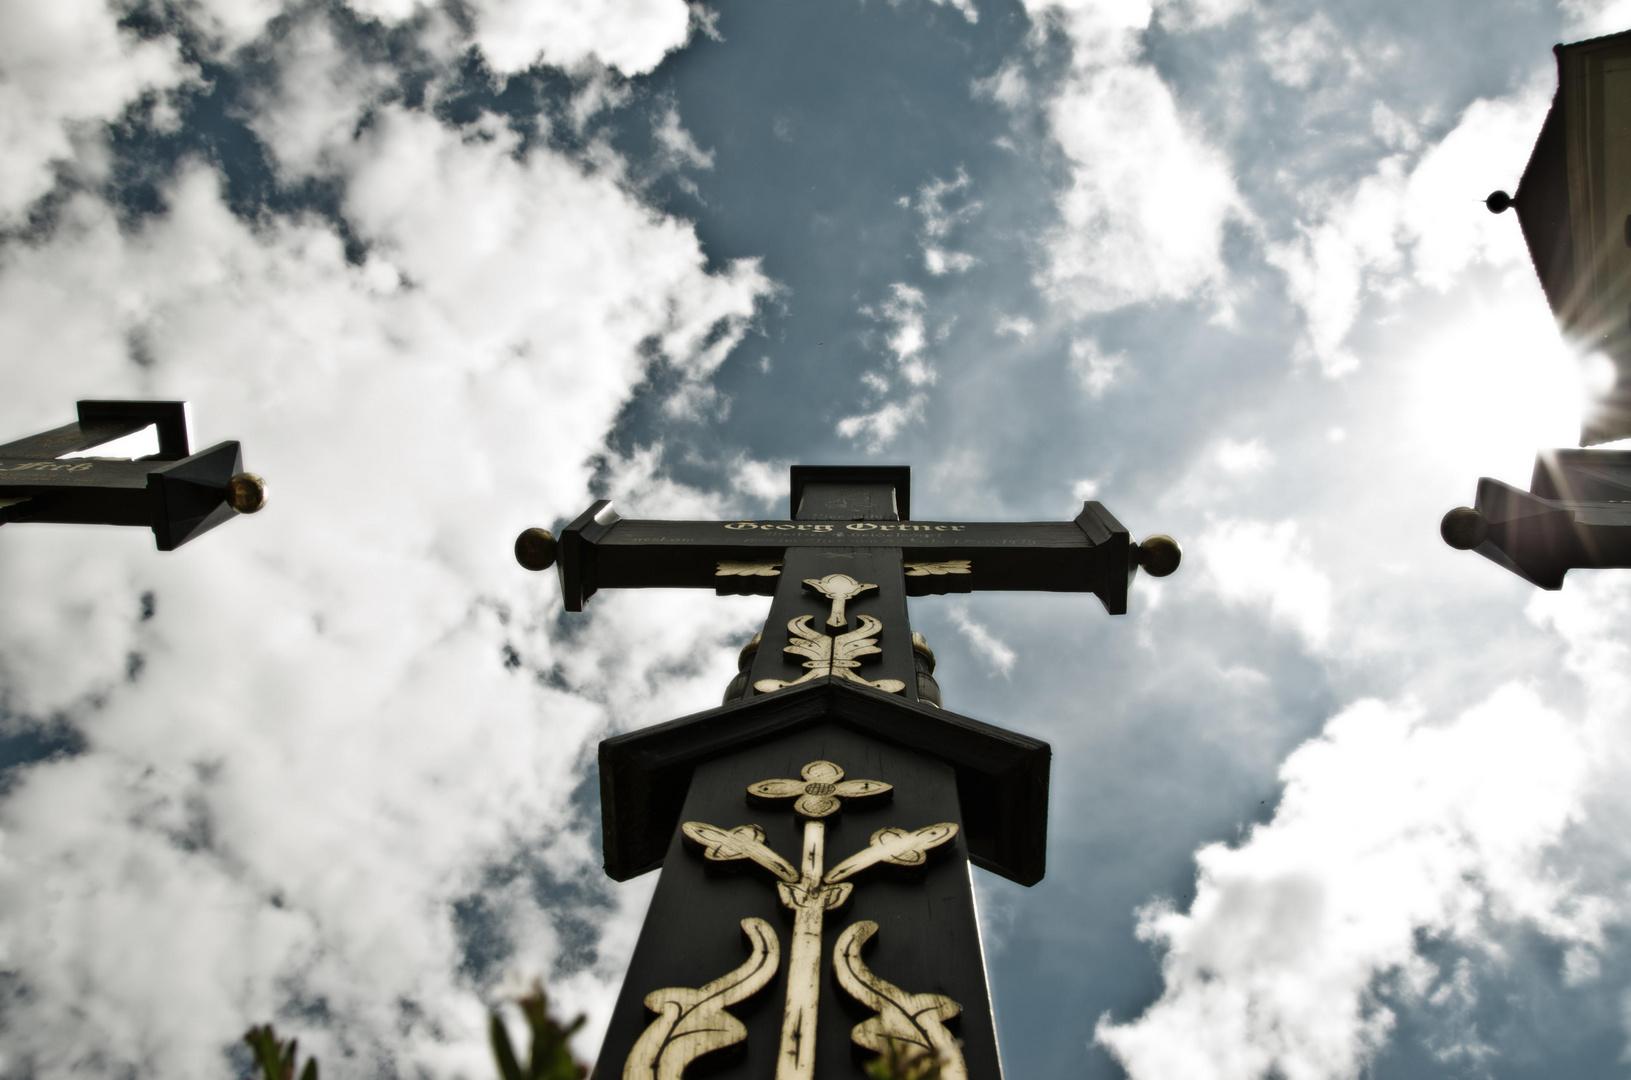 Historischer Friedhof in Segringen bei Dinkelsbühl